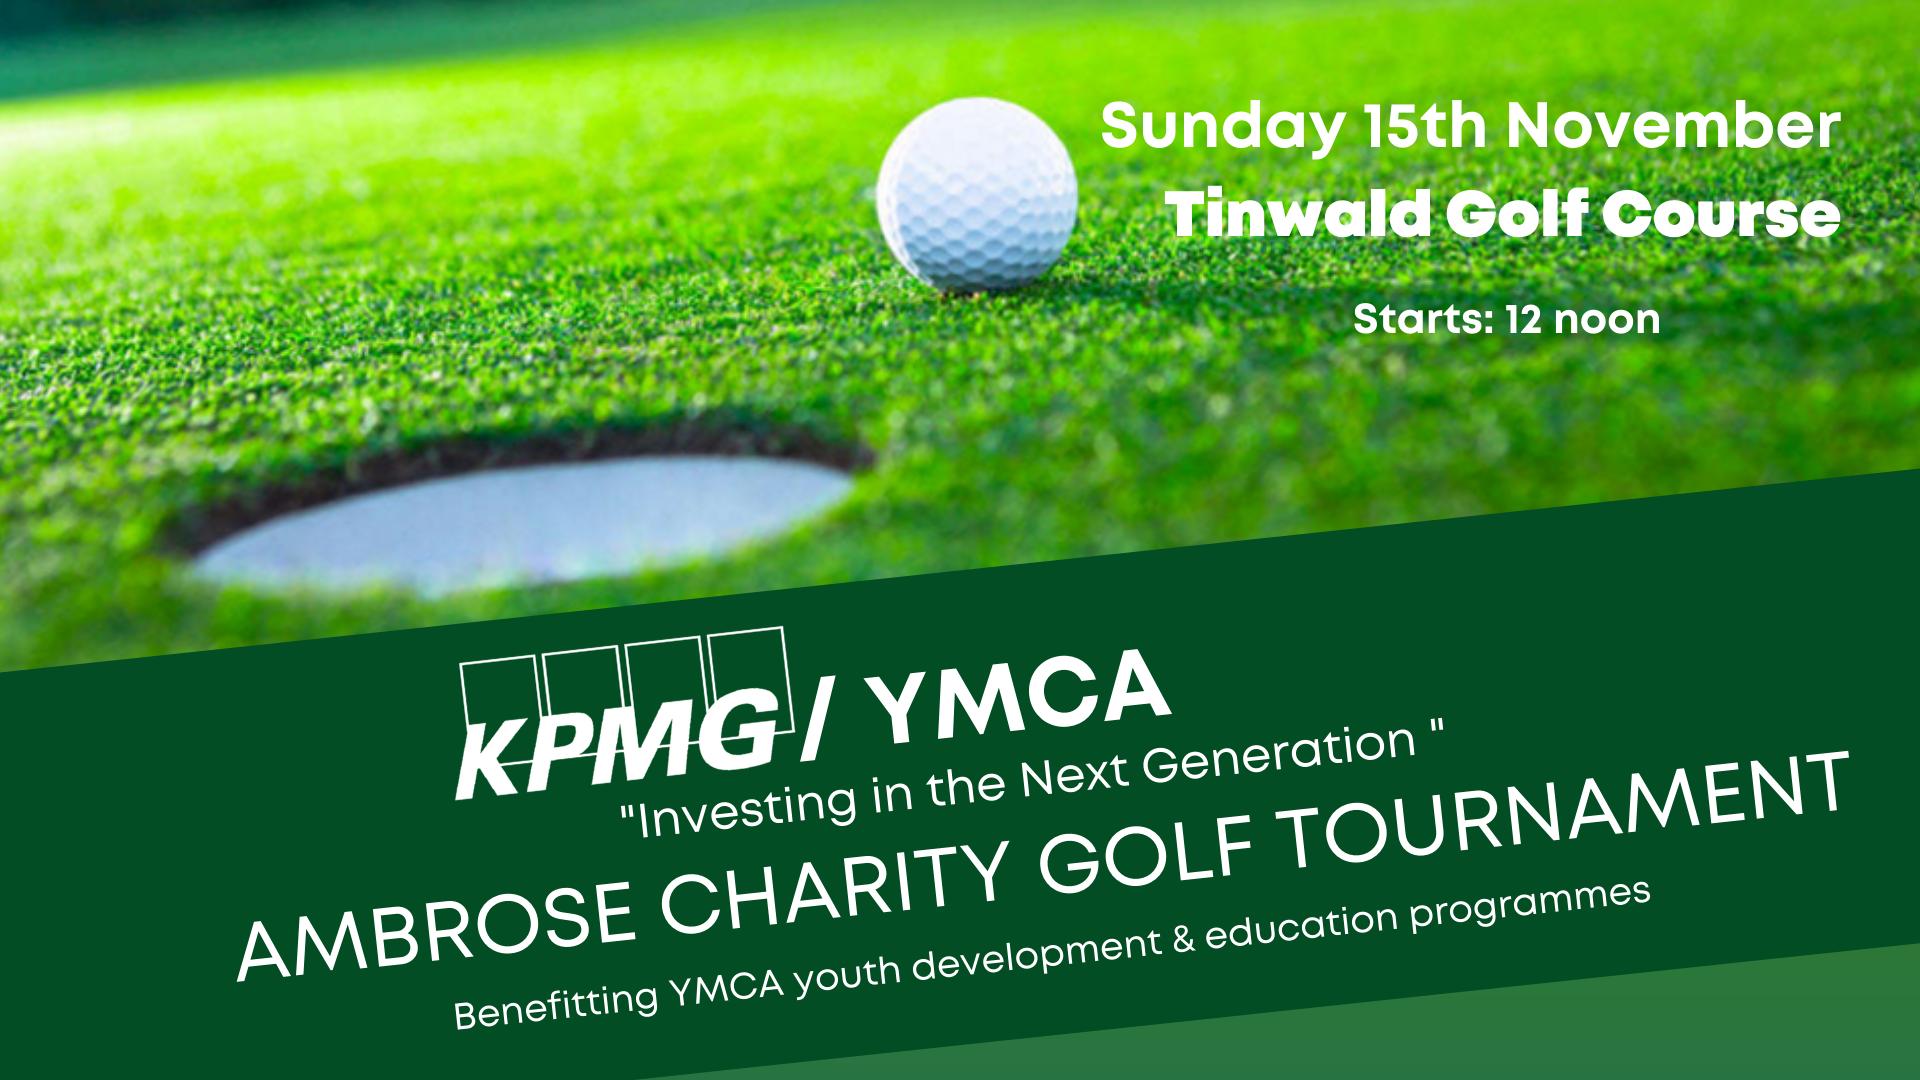 "KPMG / YMCA ""Investing in the Next Generation"" Charity Ashburton Golf Tournament"